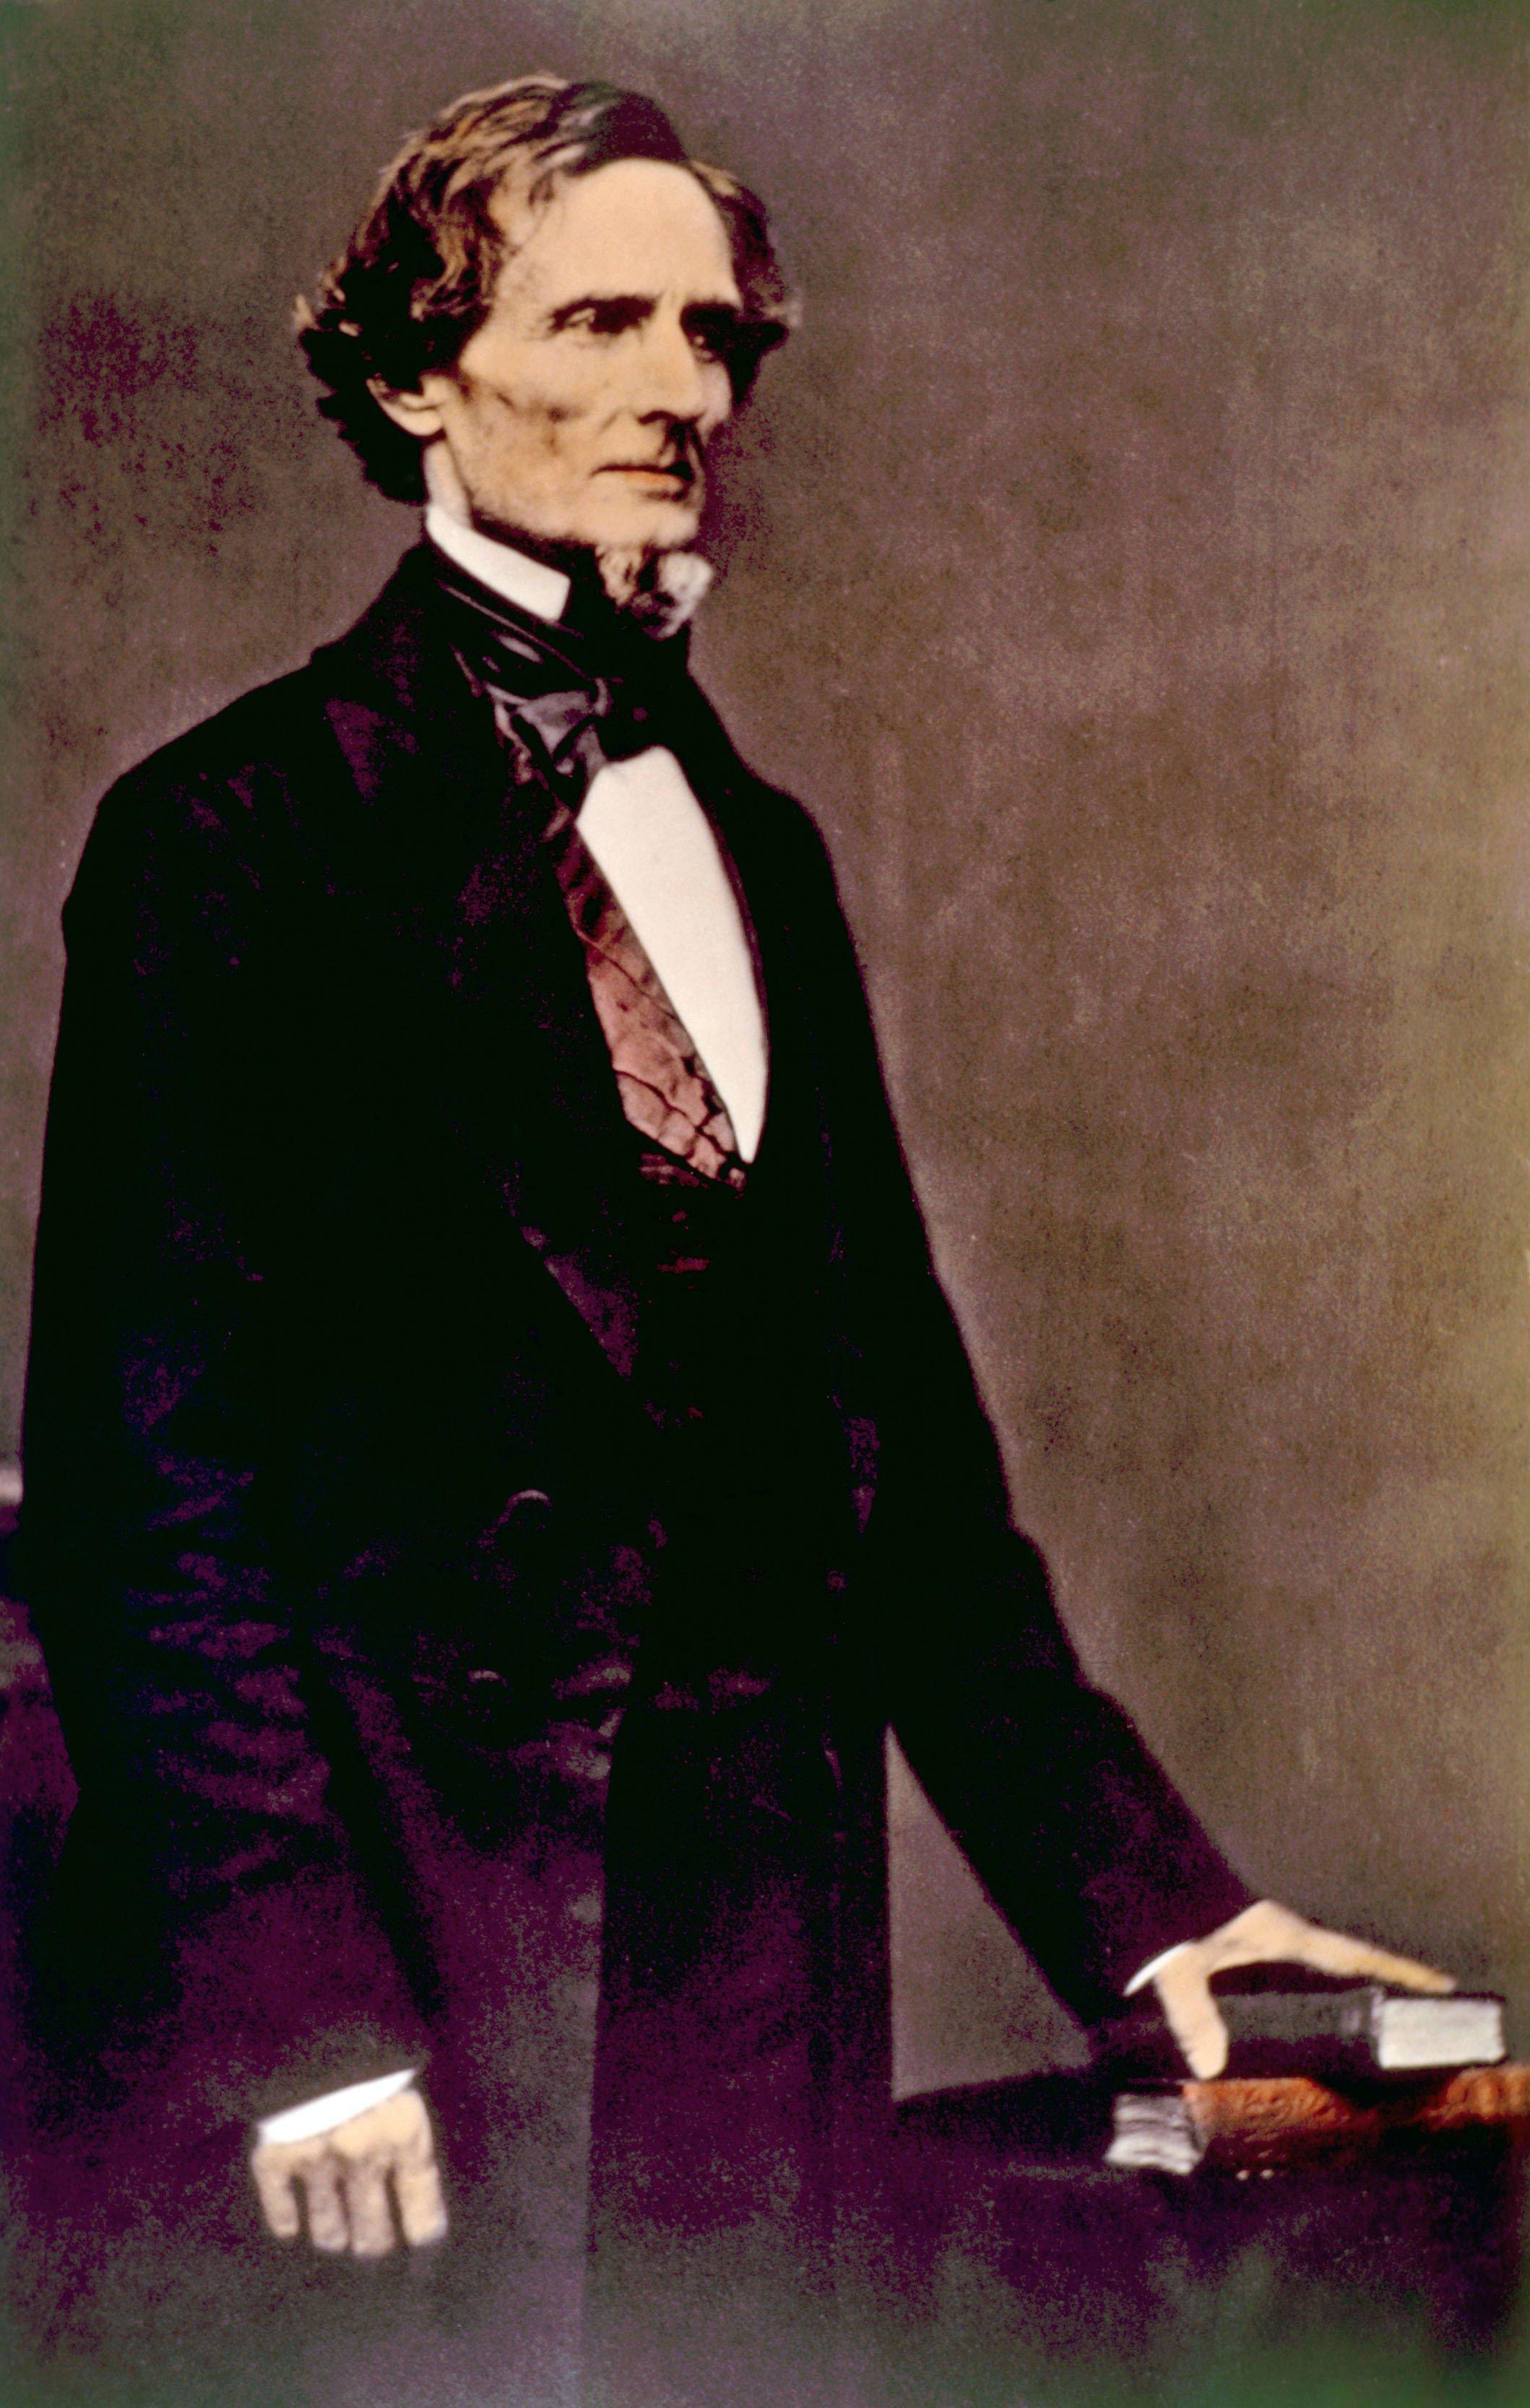 Jefferson Davis' colorized photograph (Shutterstock/ Everett Historical)